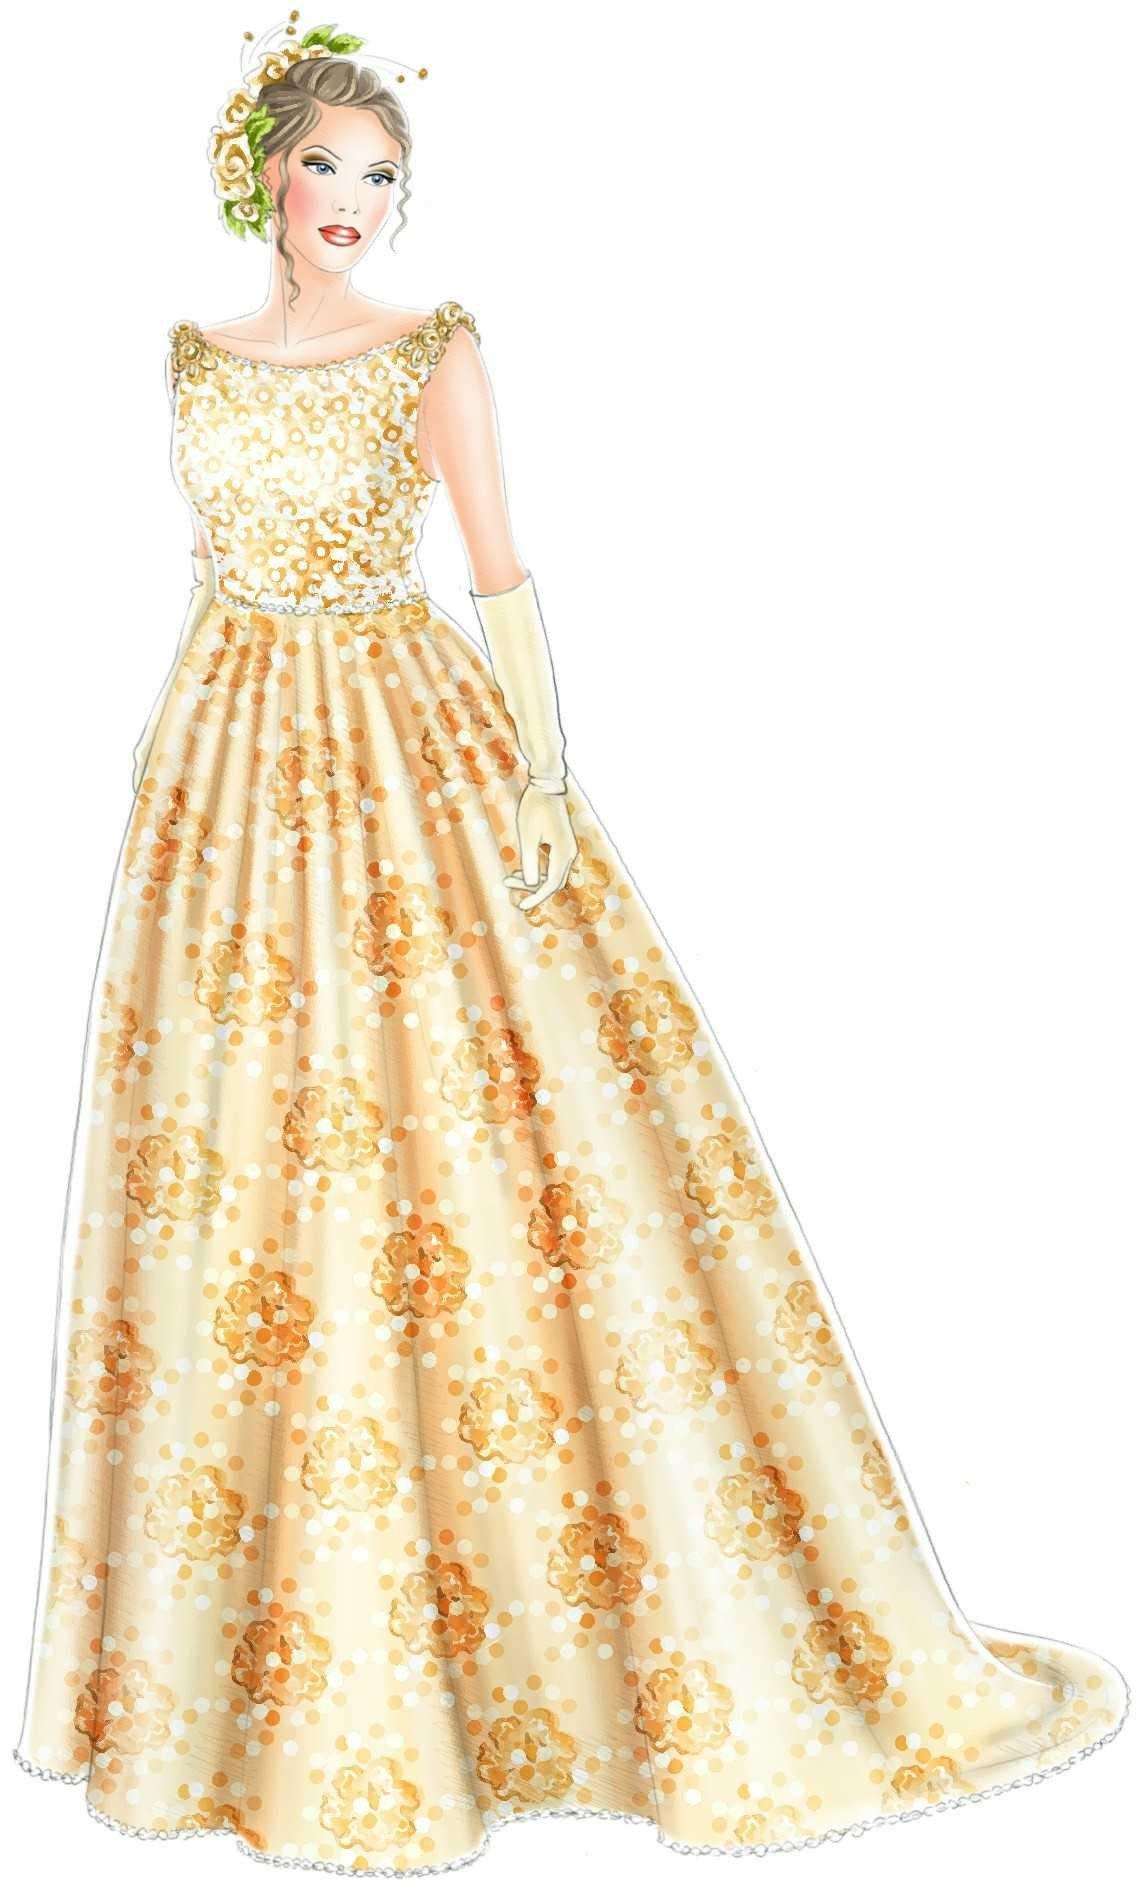 Wedding Dress Patterns Free Wedding Dress Sewing Pattern 5212 Made to Measure